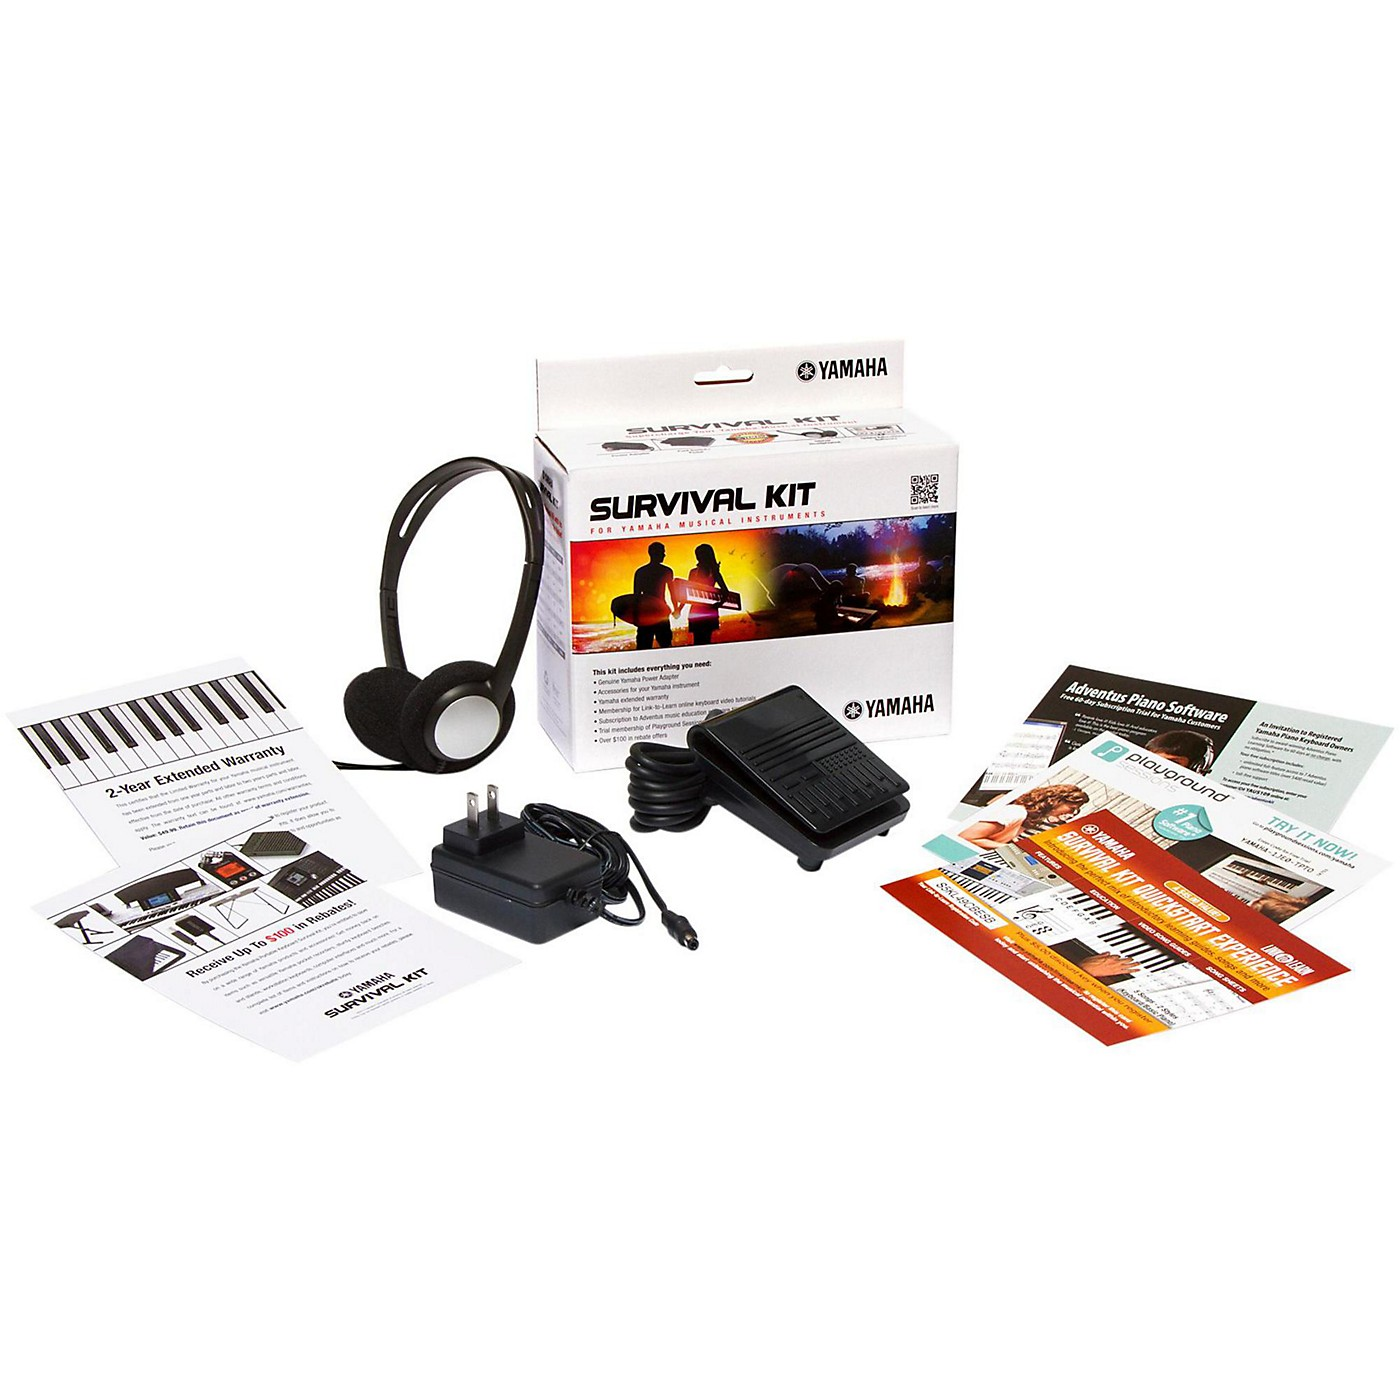 Yamaha Survival Kit D2 for PSR-E463, YPG-535 and NP-32 thumbnail